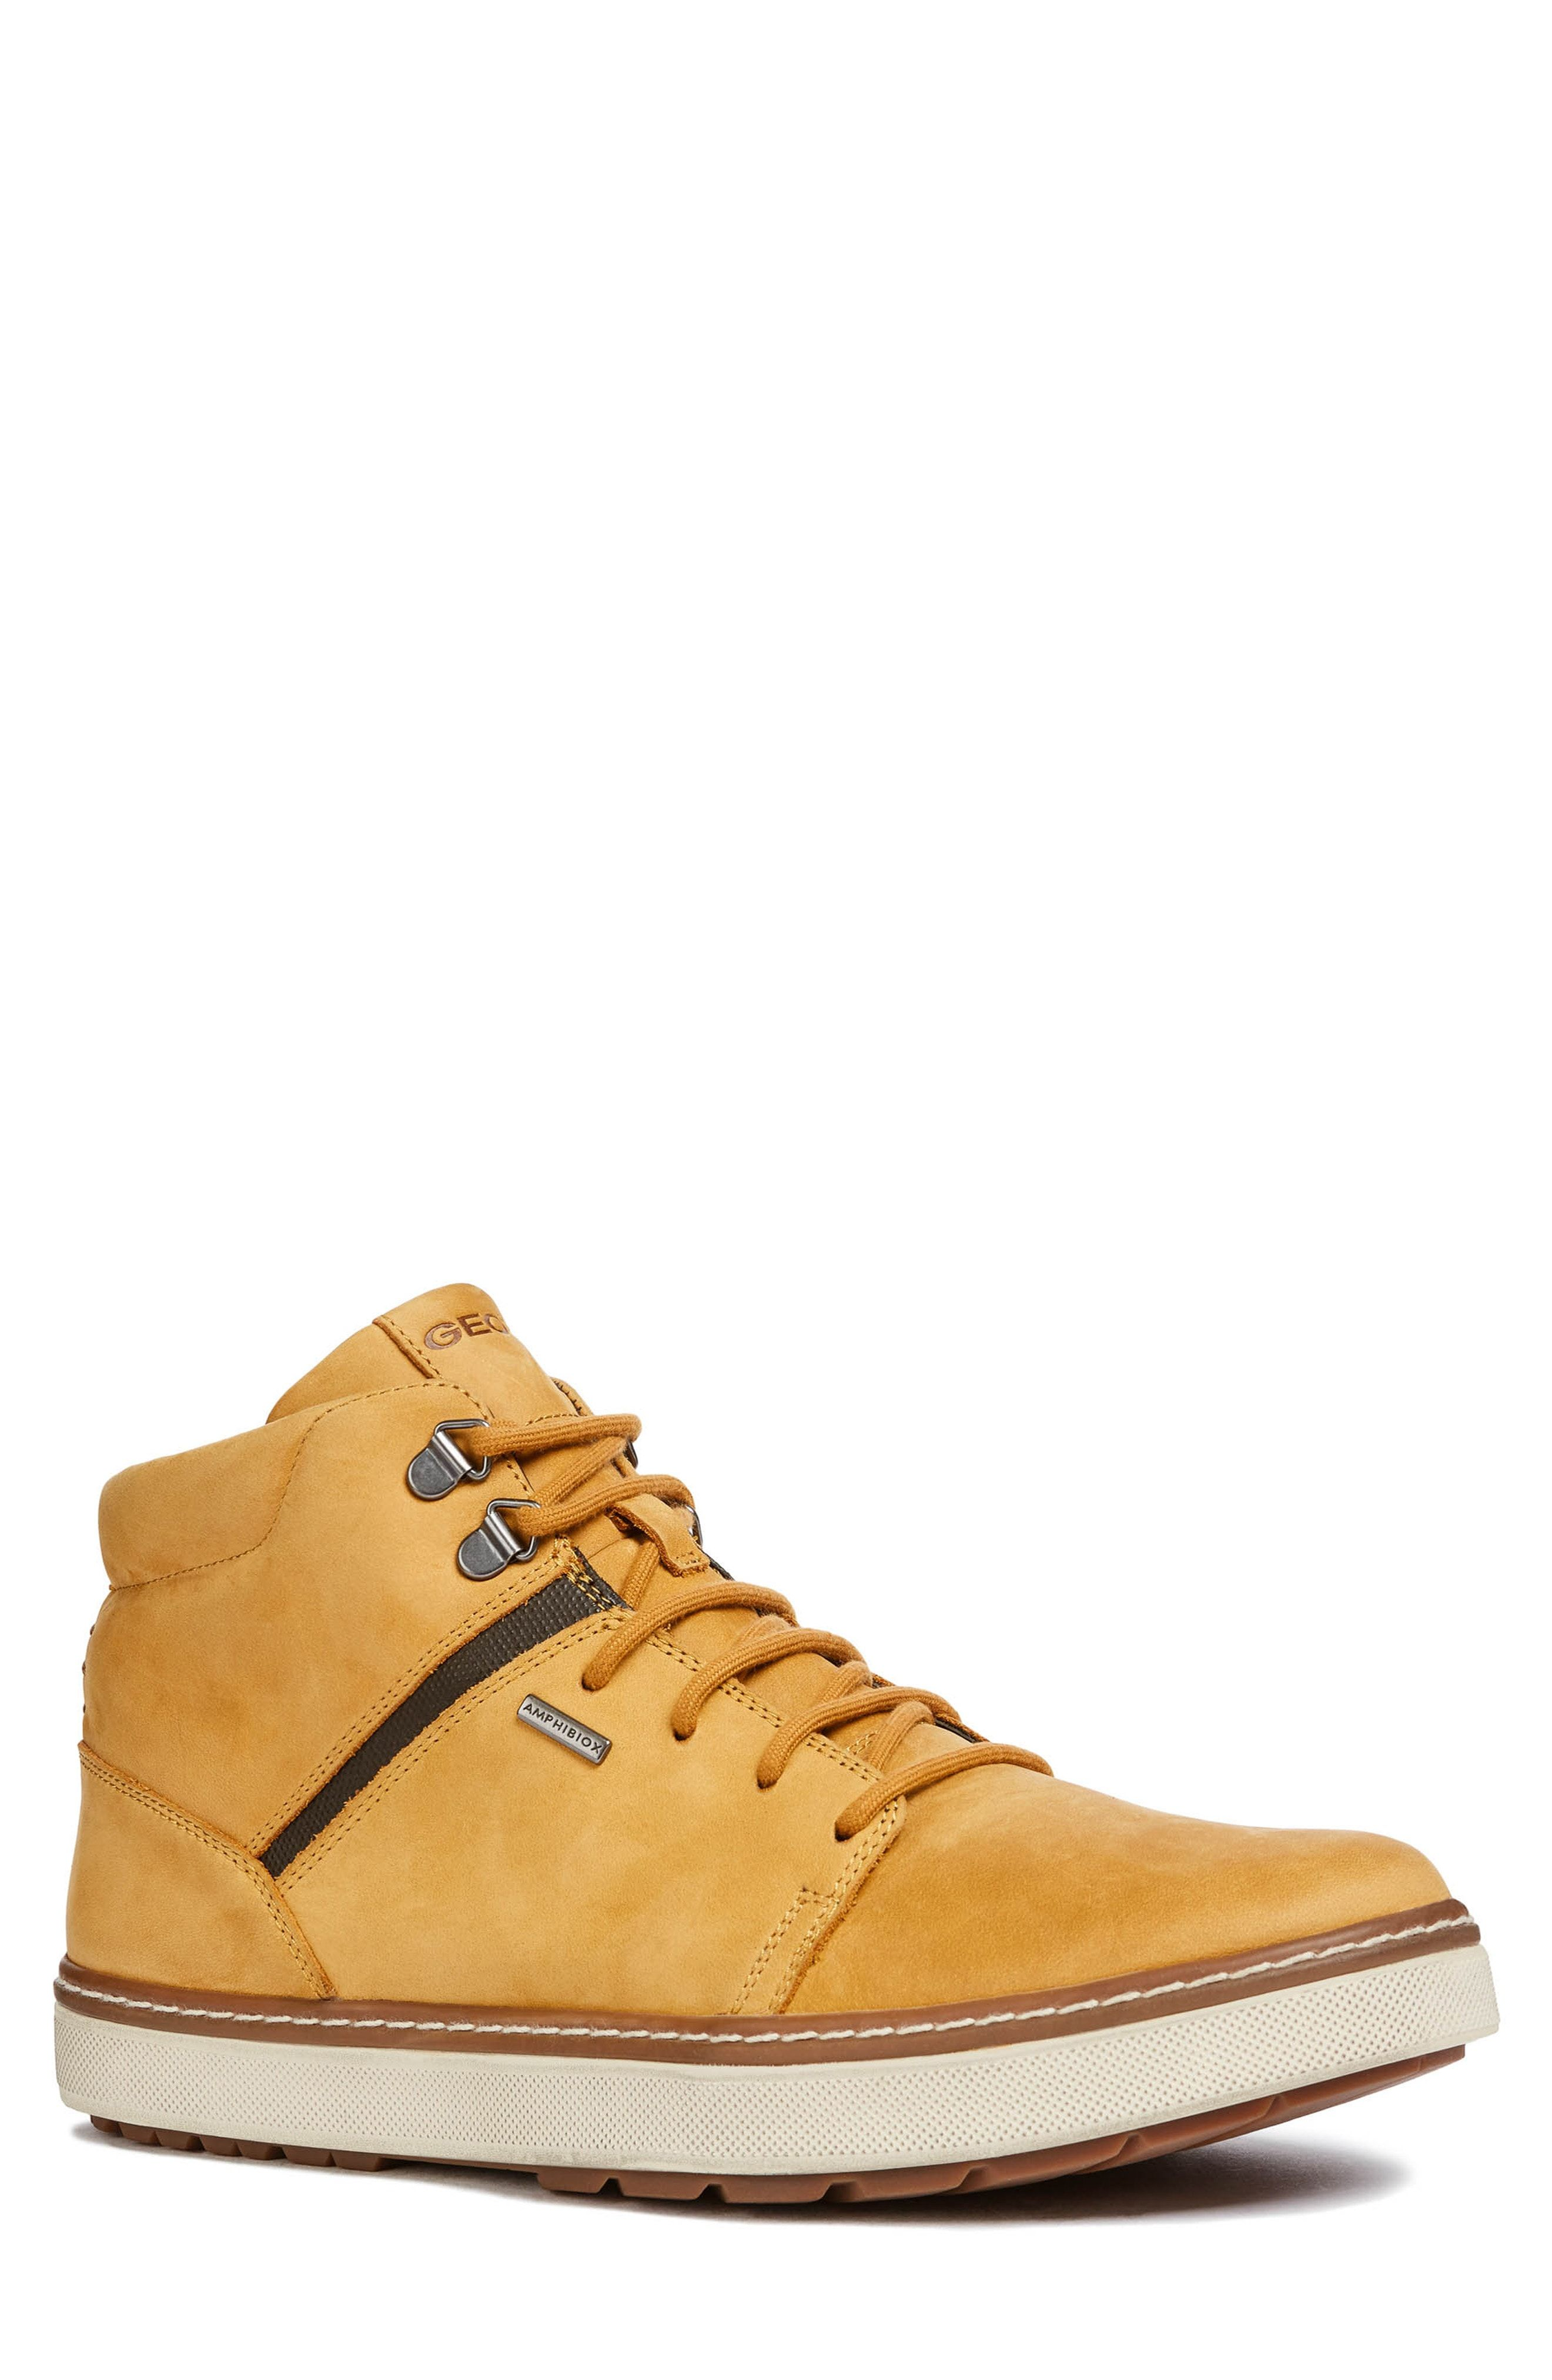 Betsy Trotwood No puedo leer ni escribir túnel  GEOX MATTIAS AMPHIBIOX WATERPROOF BOOT. #geox #shoes | Waterproof boots,  Boots, Geox